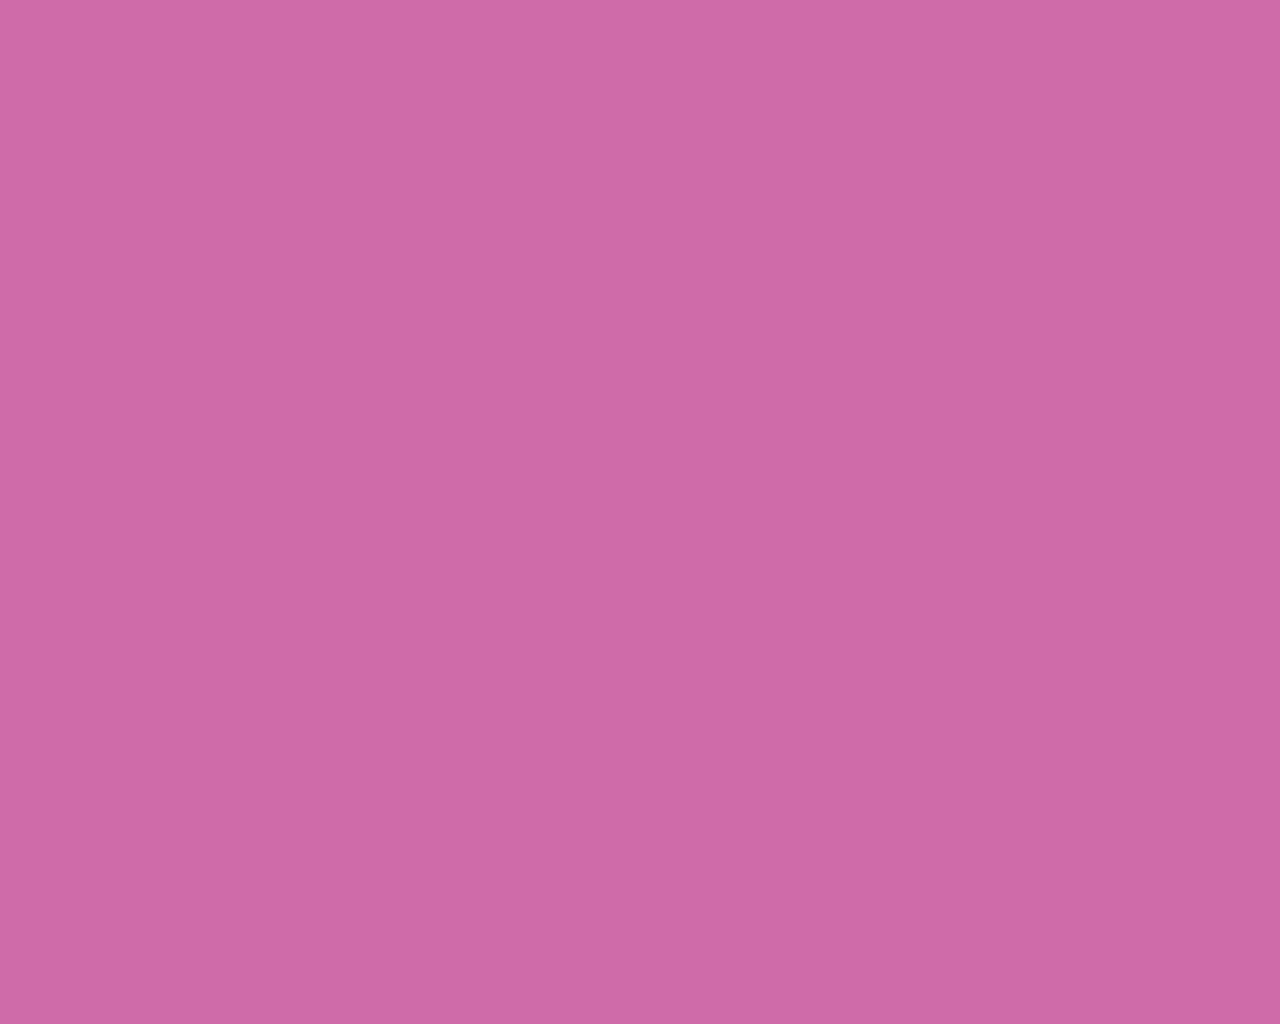 1280x1024 Super Pink Solid Color Background